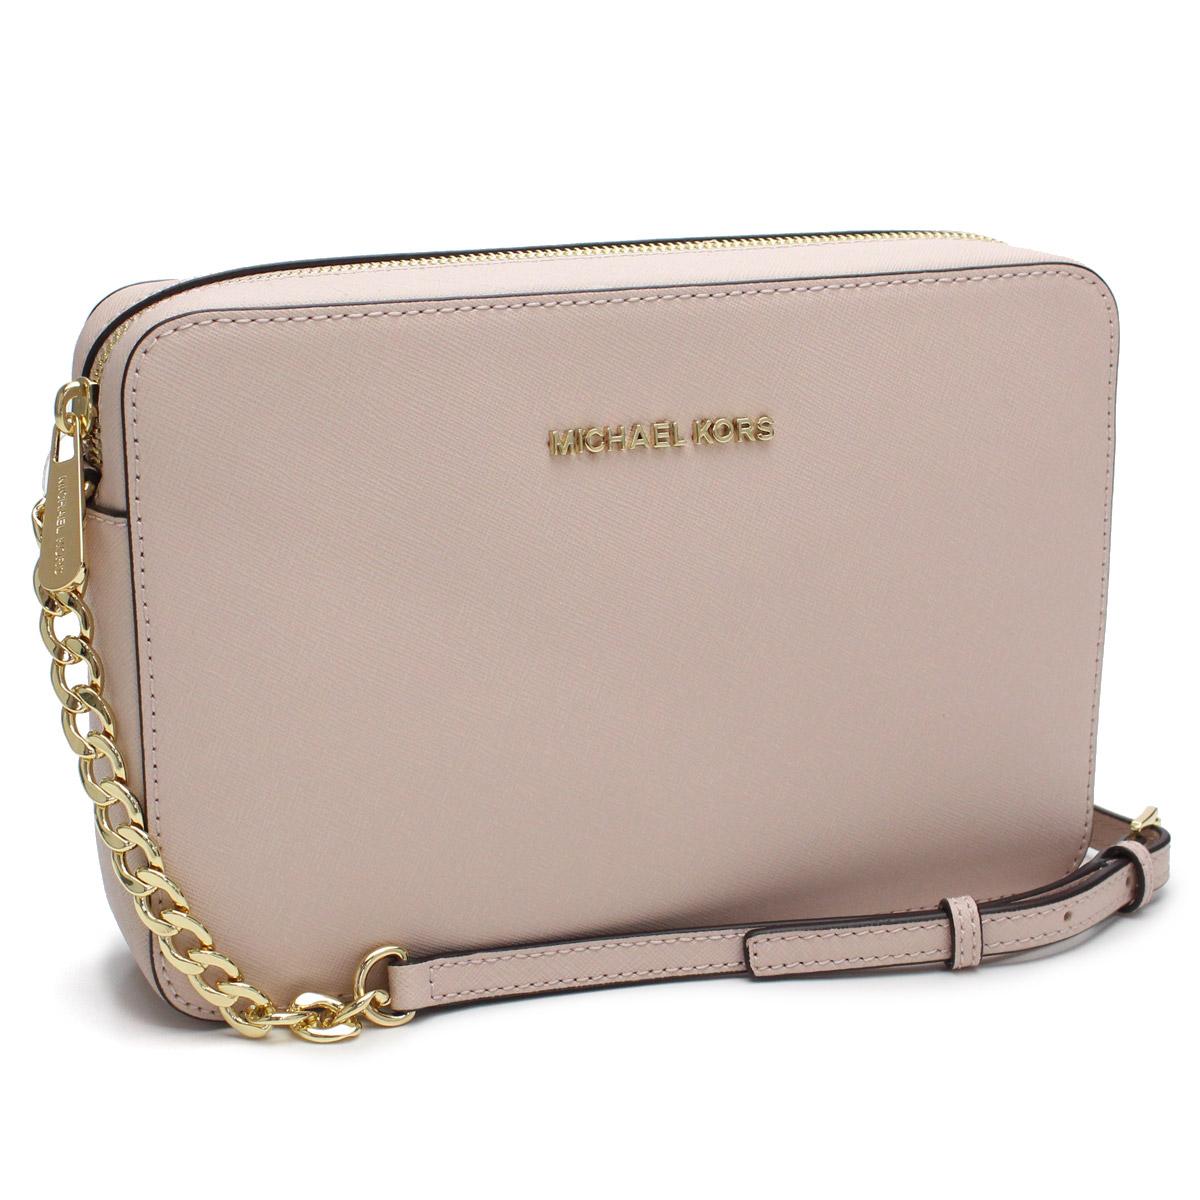 be55656a4828 Bighit The total brand wholesale  Take Michael Kors (MICHAEL KORS) slant   shoulder bag 32S4GTVC3L SOFT PINK pink system